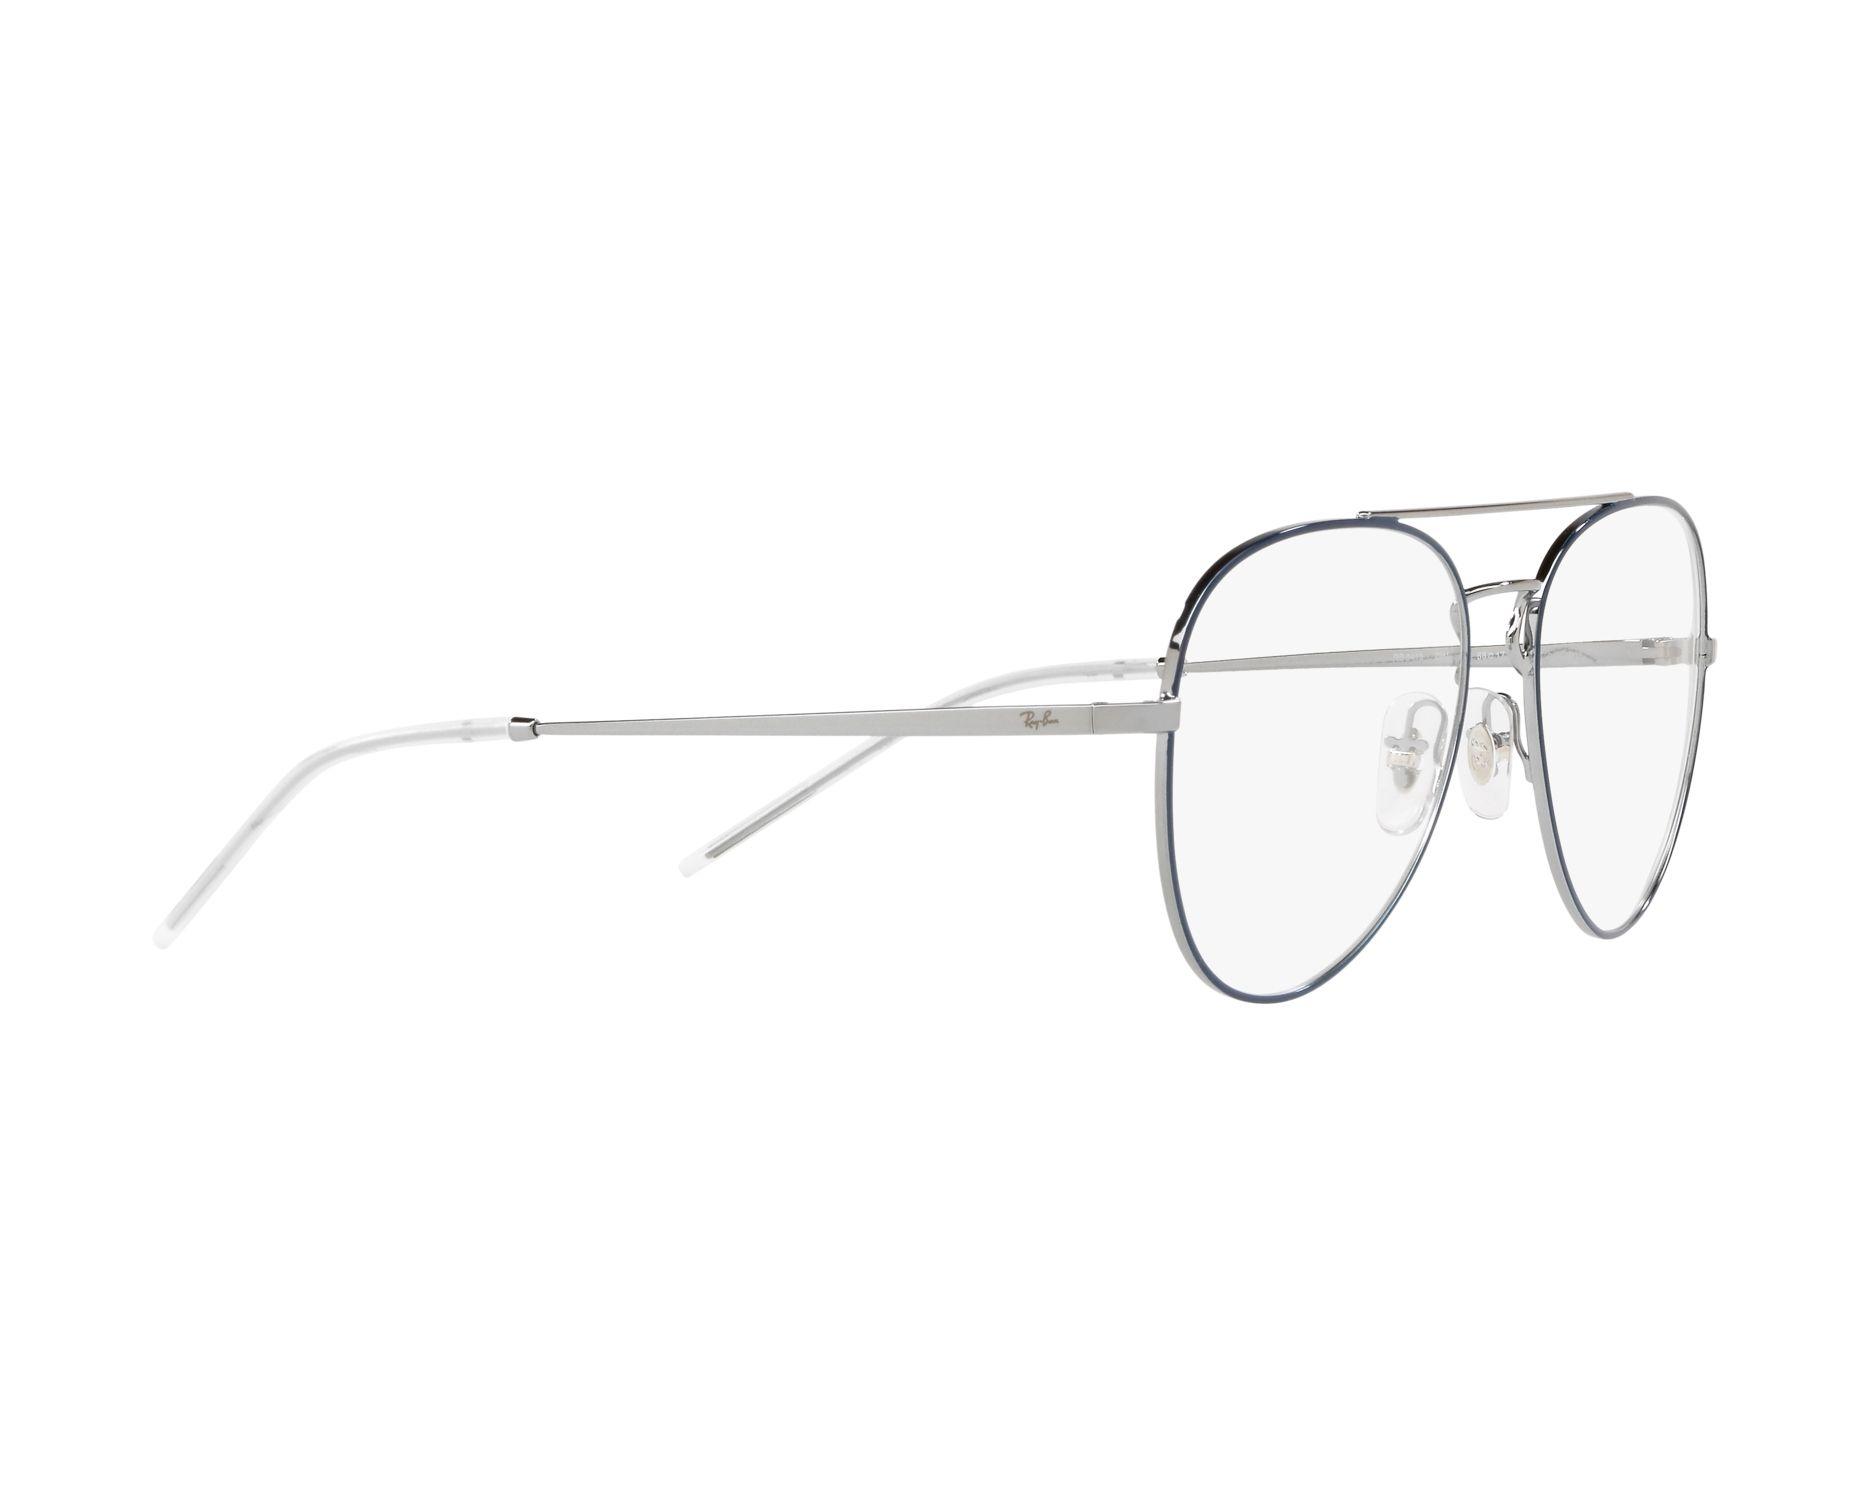 1cf34cac3a5 eyeglasses Ray-Ban RX-6413 2981 54-17 Blue Silver 360 degree view